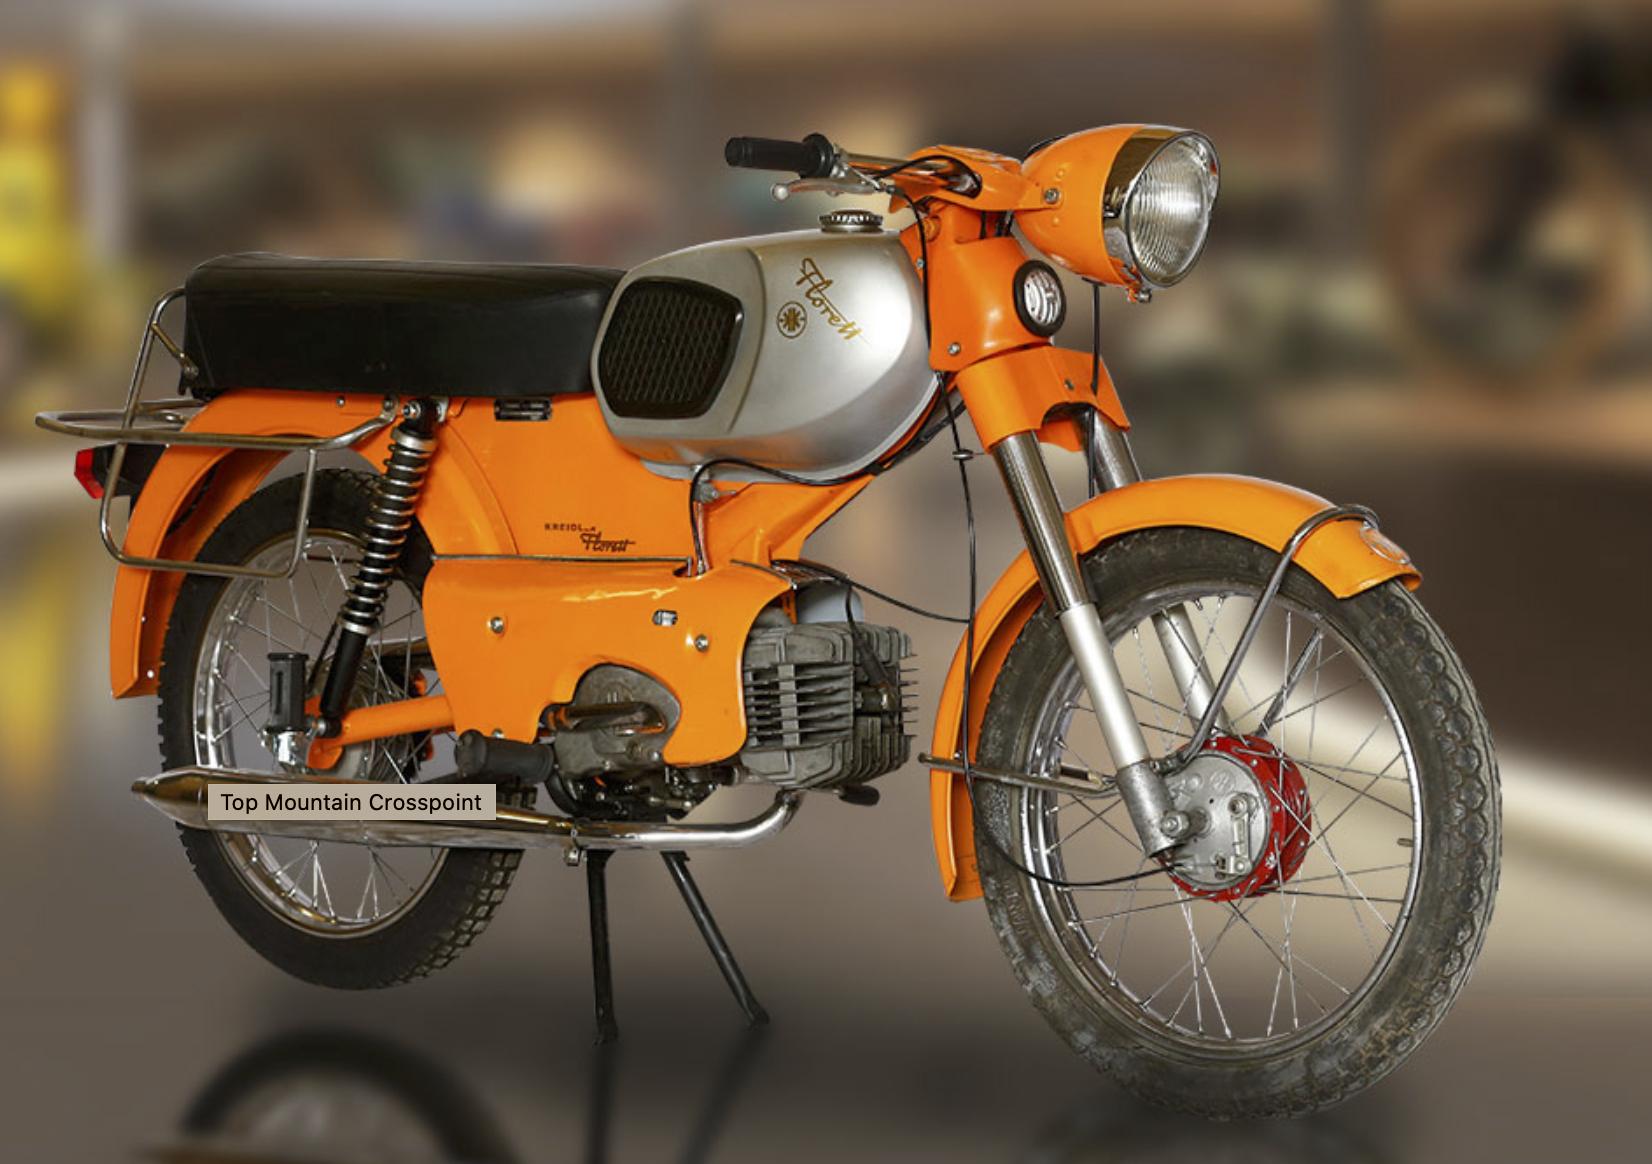 Top Mountain Motorcycle Museum vintage motorcycle 1